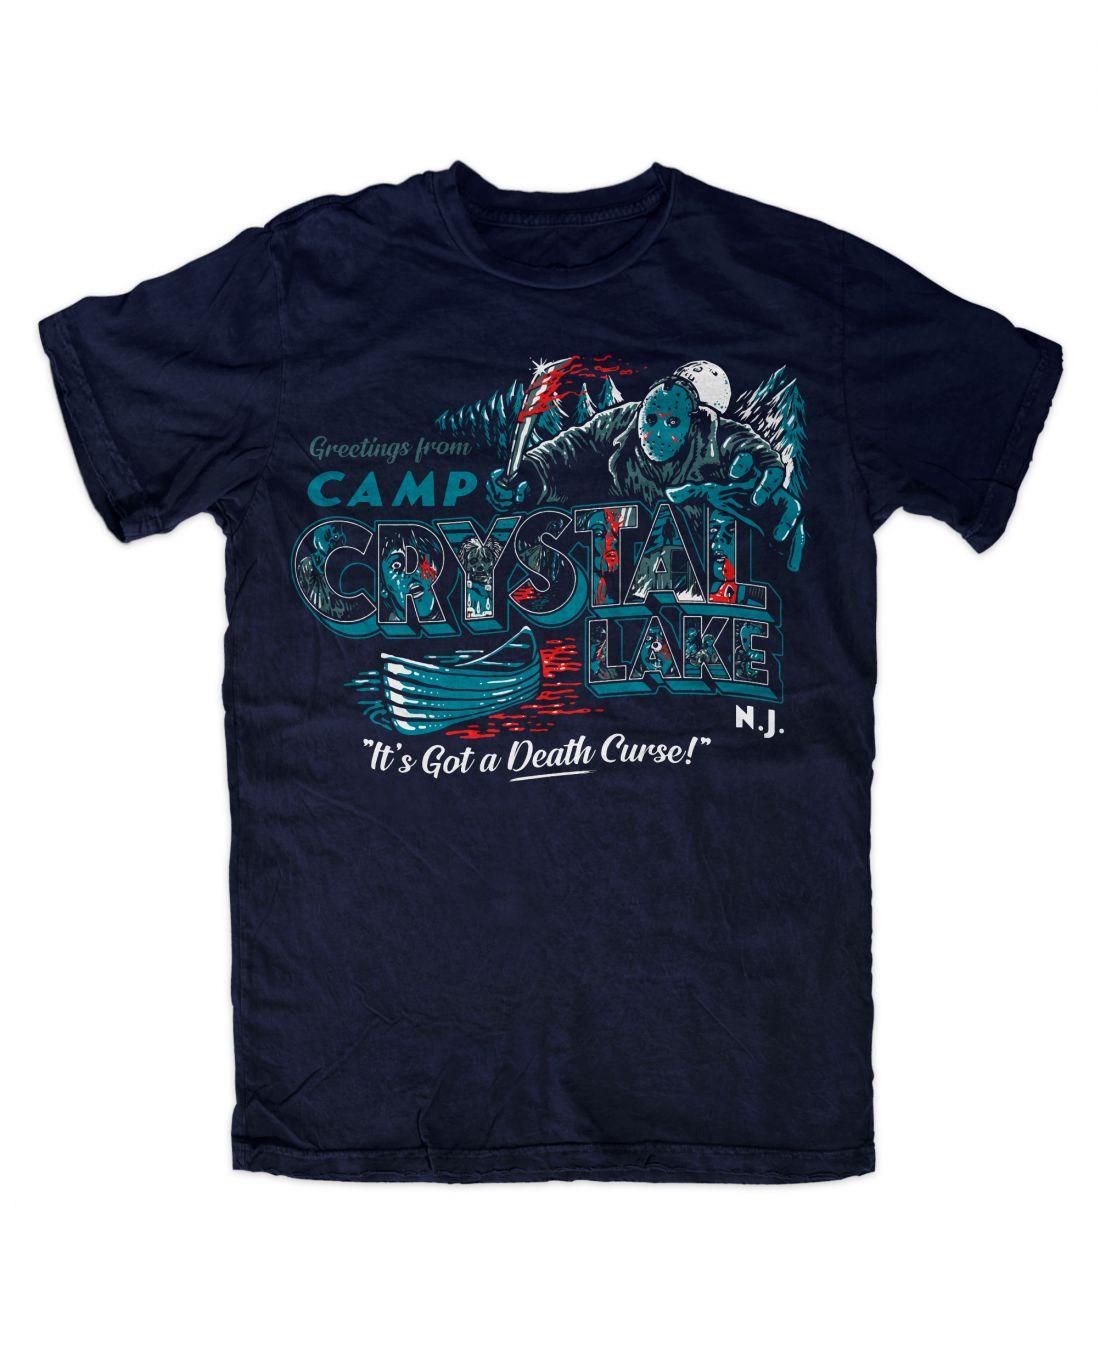 Greetings From Camp Crystal Lake (navy blue póló)